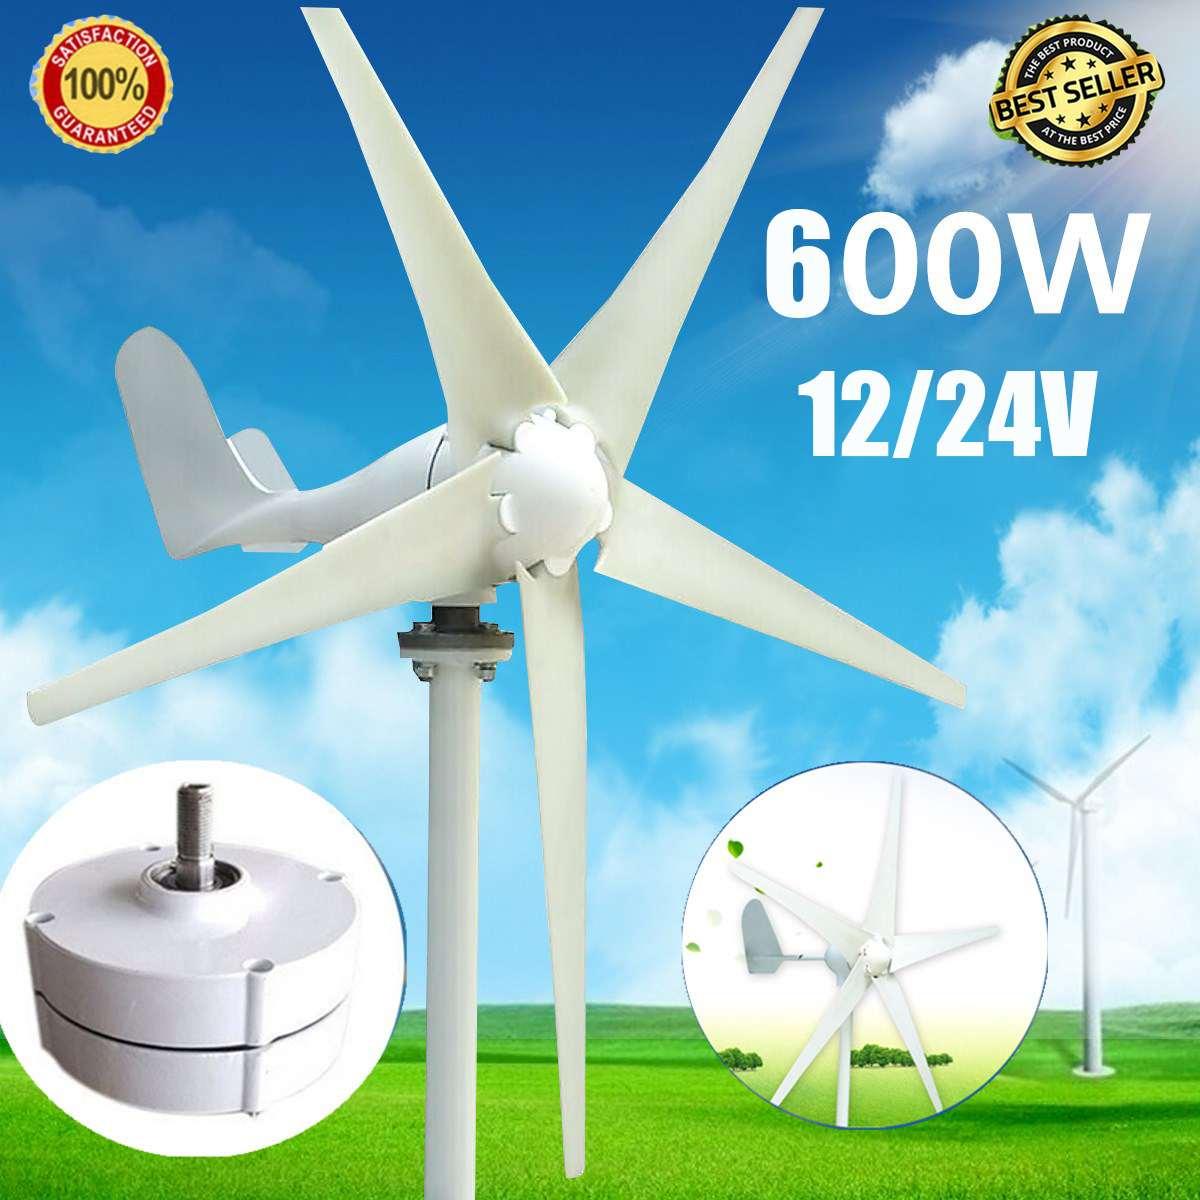 Wind T urbine Generator Max 600W DC 12V/24V 5 Blade Household Wind Generator 12V/24V 600W Permanent Magnet Generator Tu rbine System     - title=